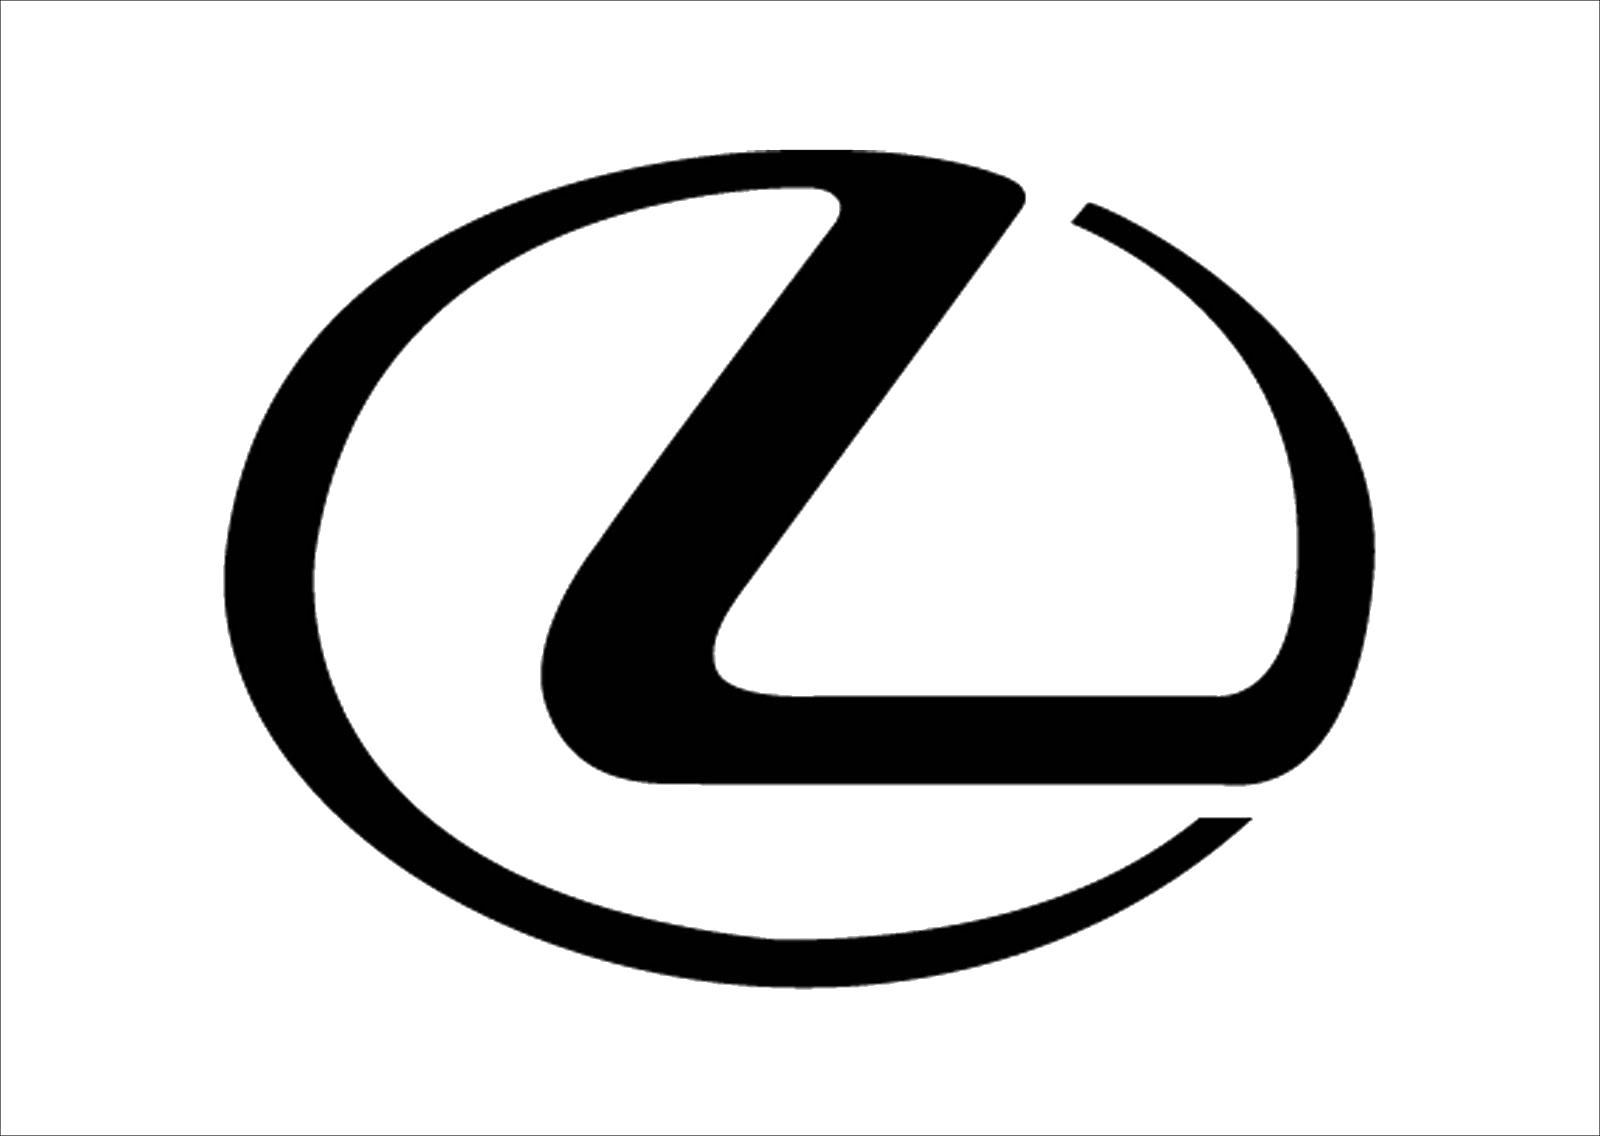 Logo de Lexus copia.png